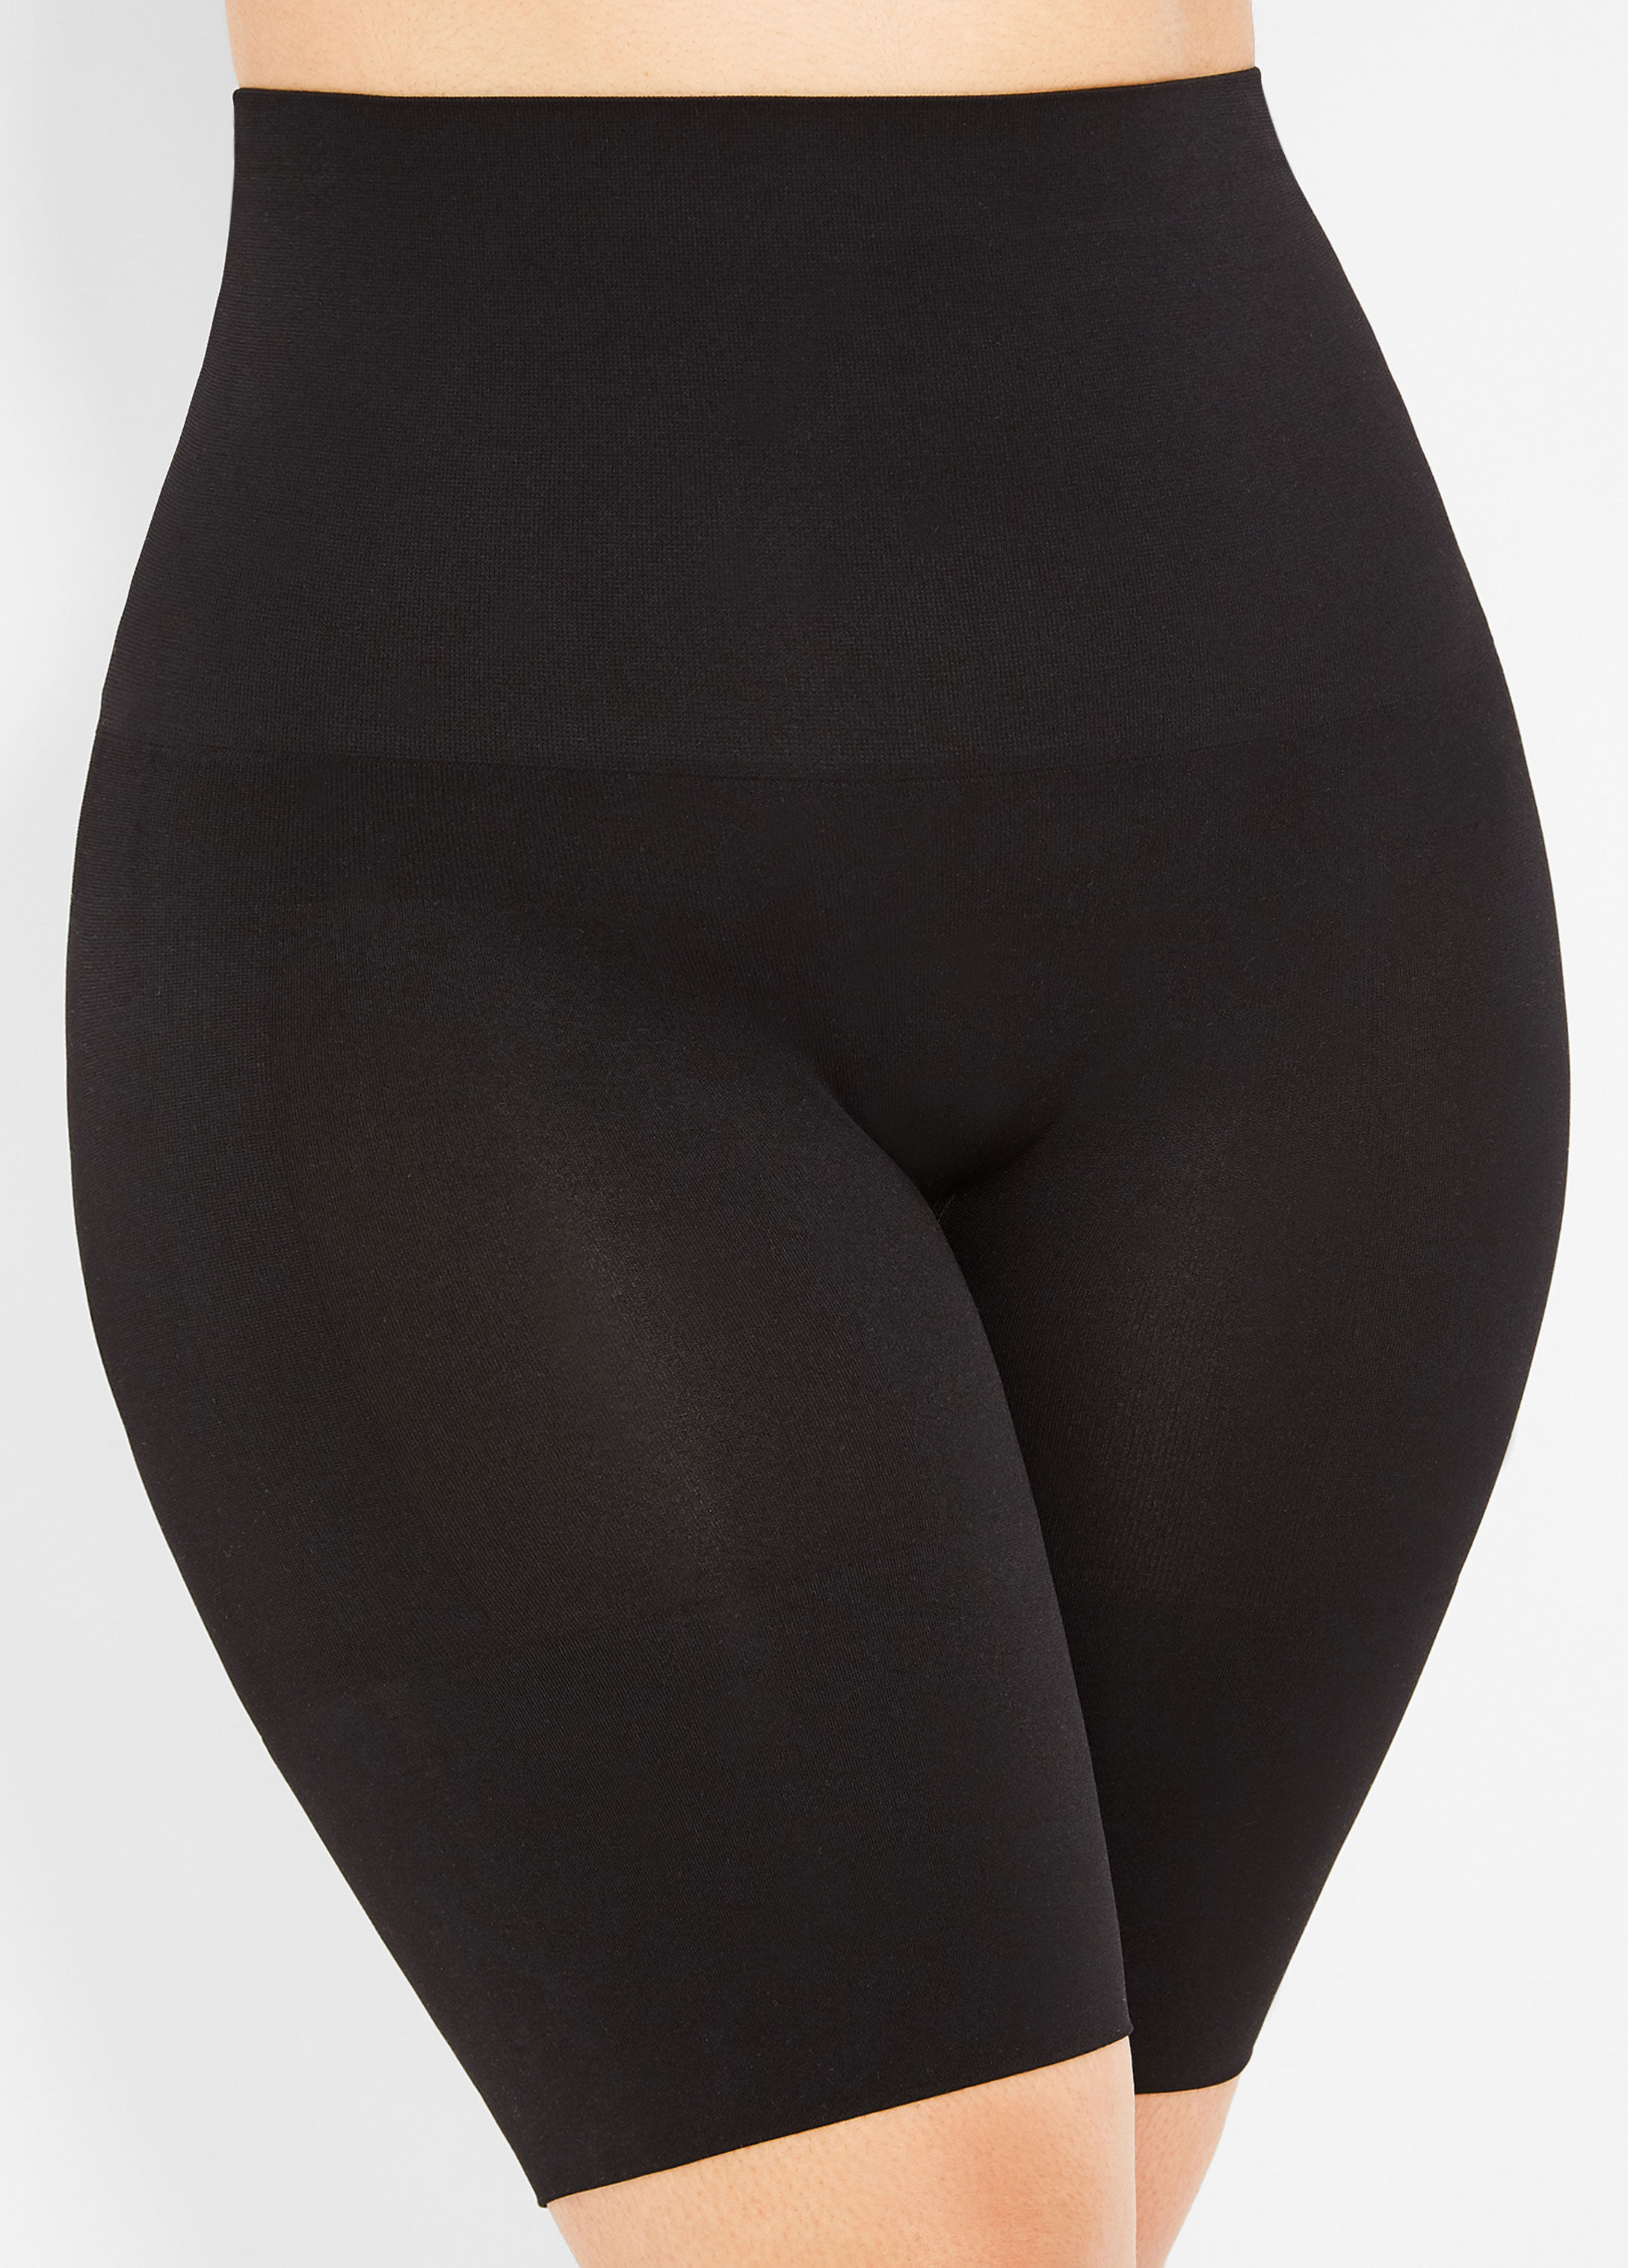 Long Leg Shaping Shorts